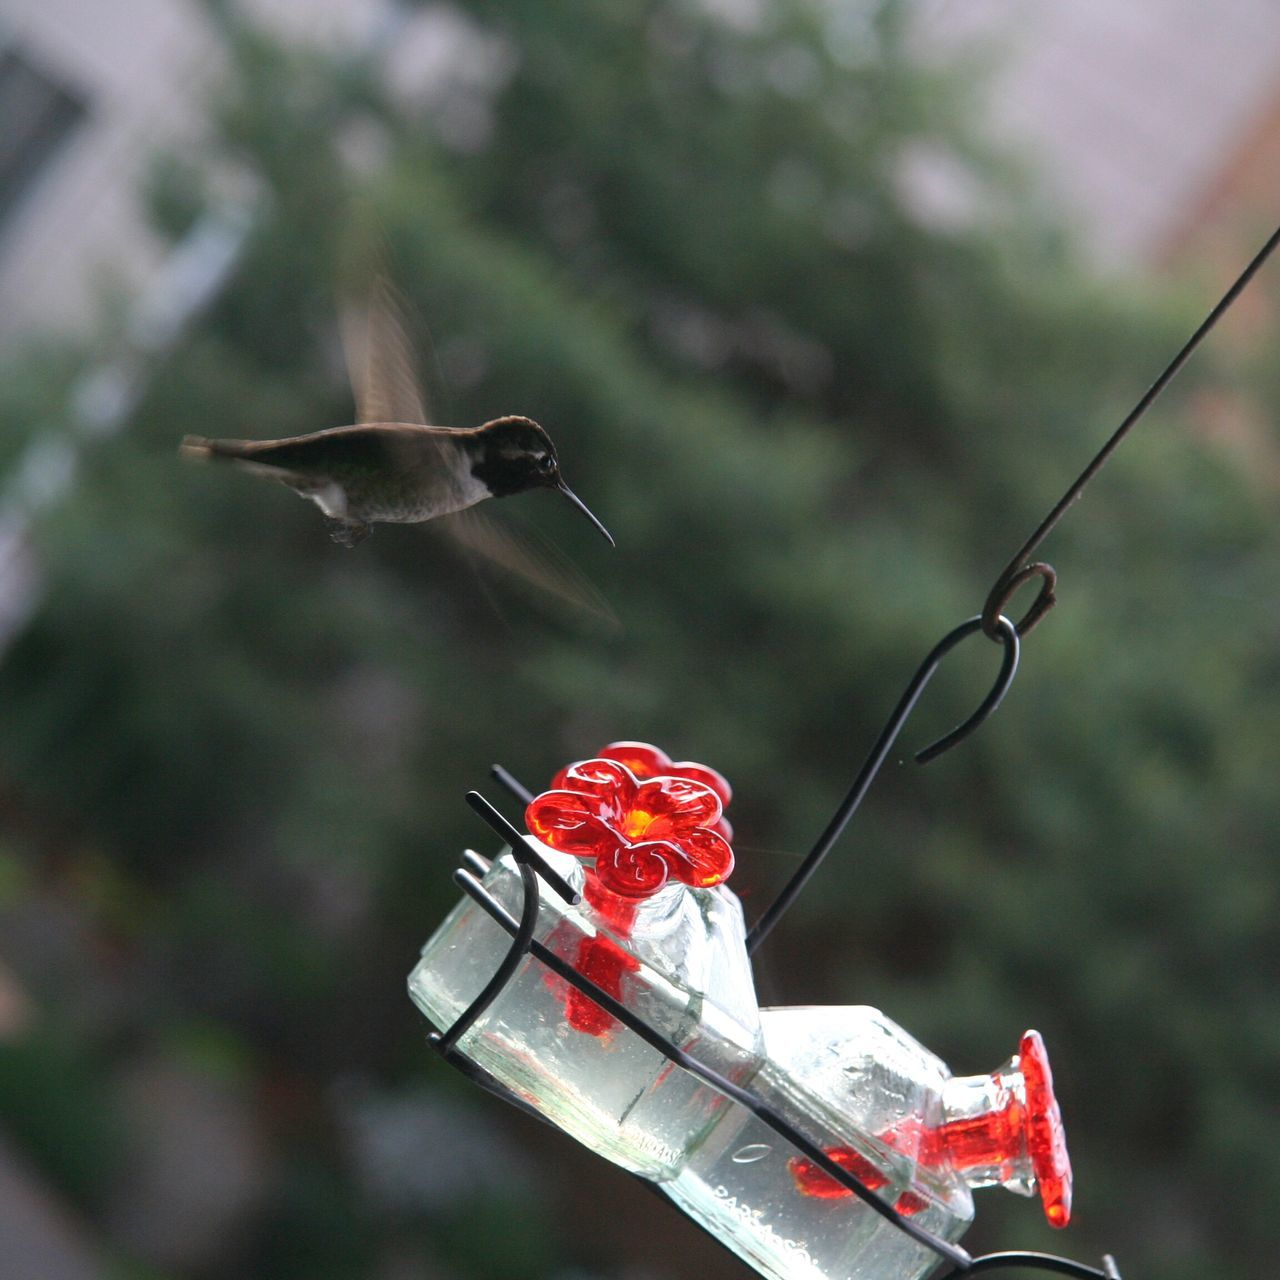 Close-Up Of Hummingbird Flying